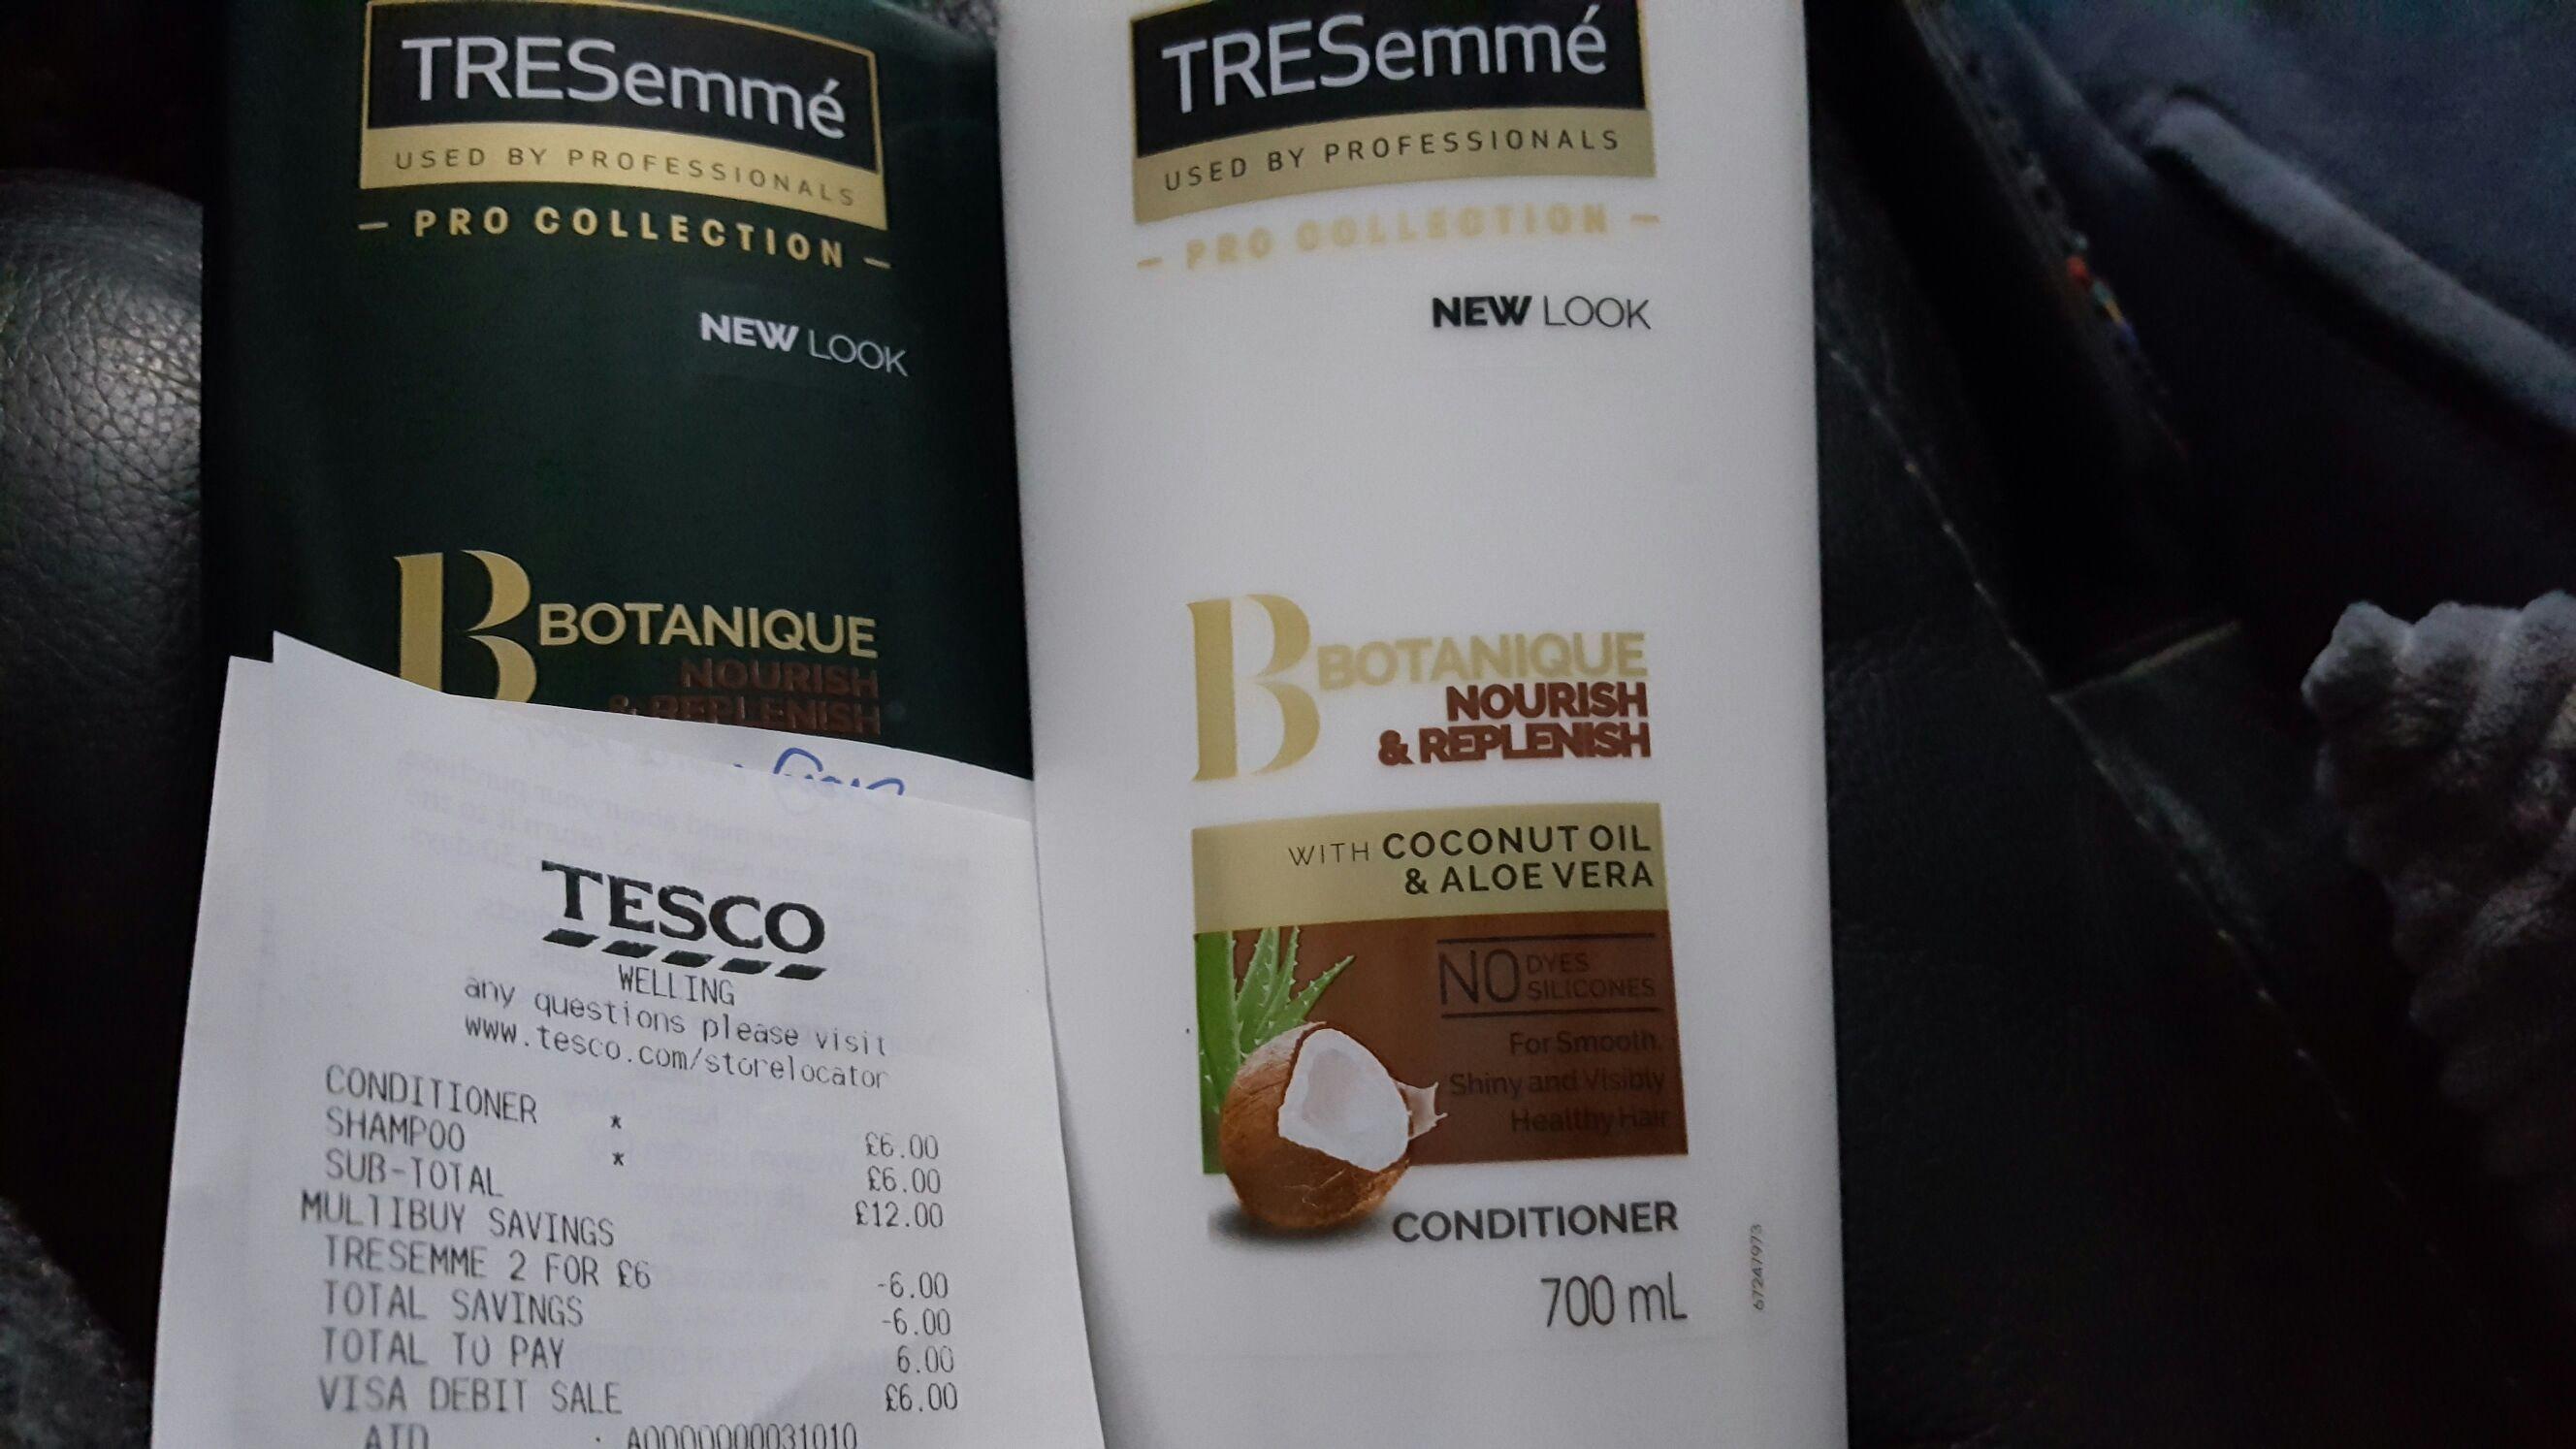 Tresemme shampoo/conditioner 700ml - 2 bottles for £6 instore @ Tesco